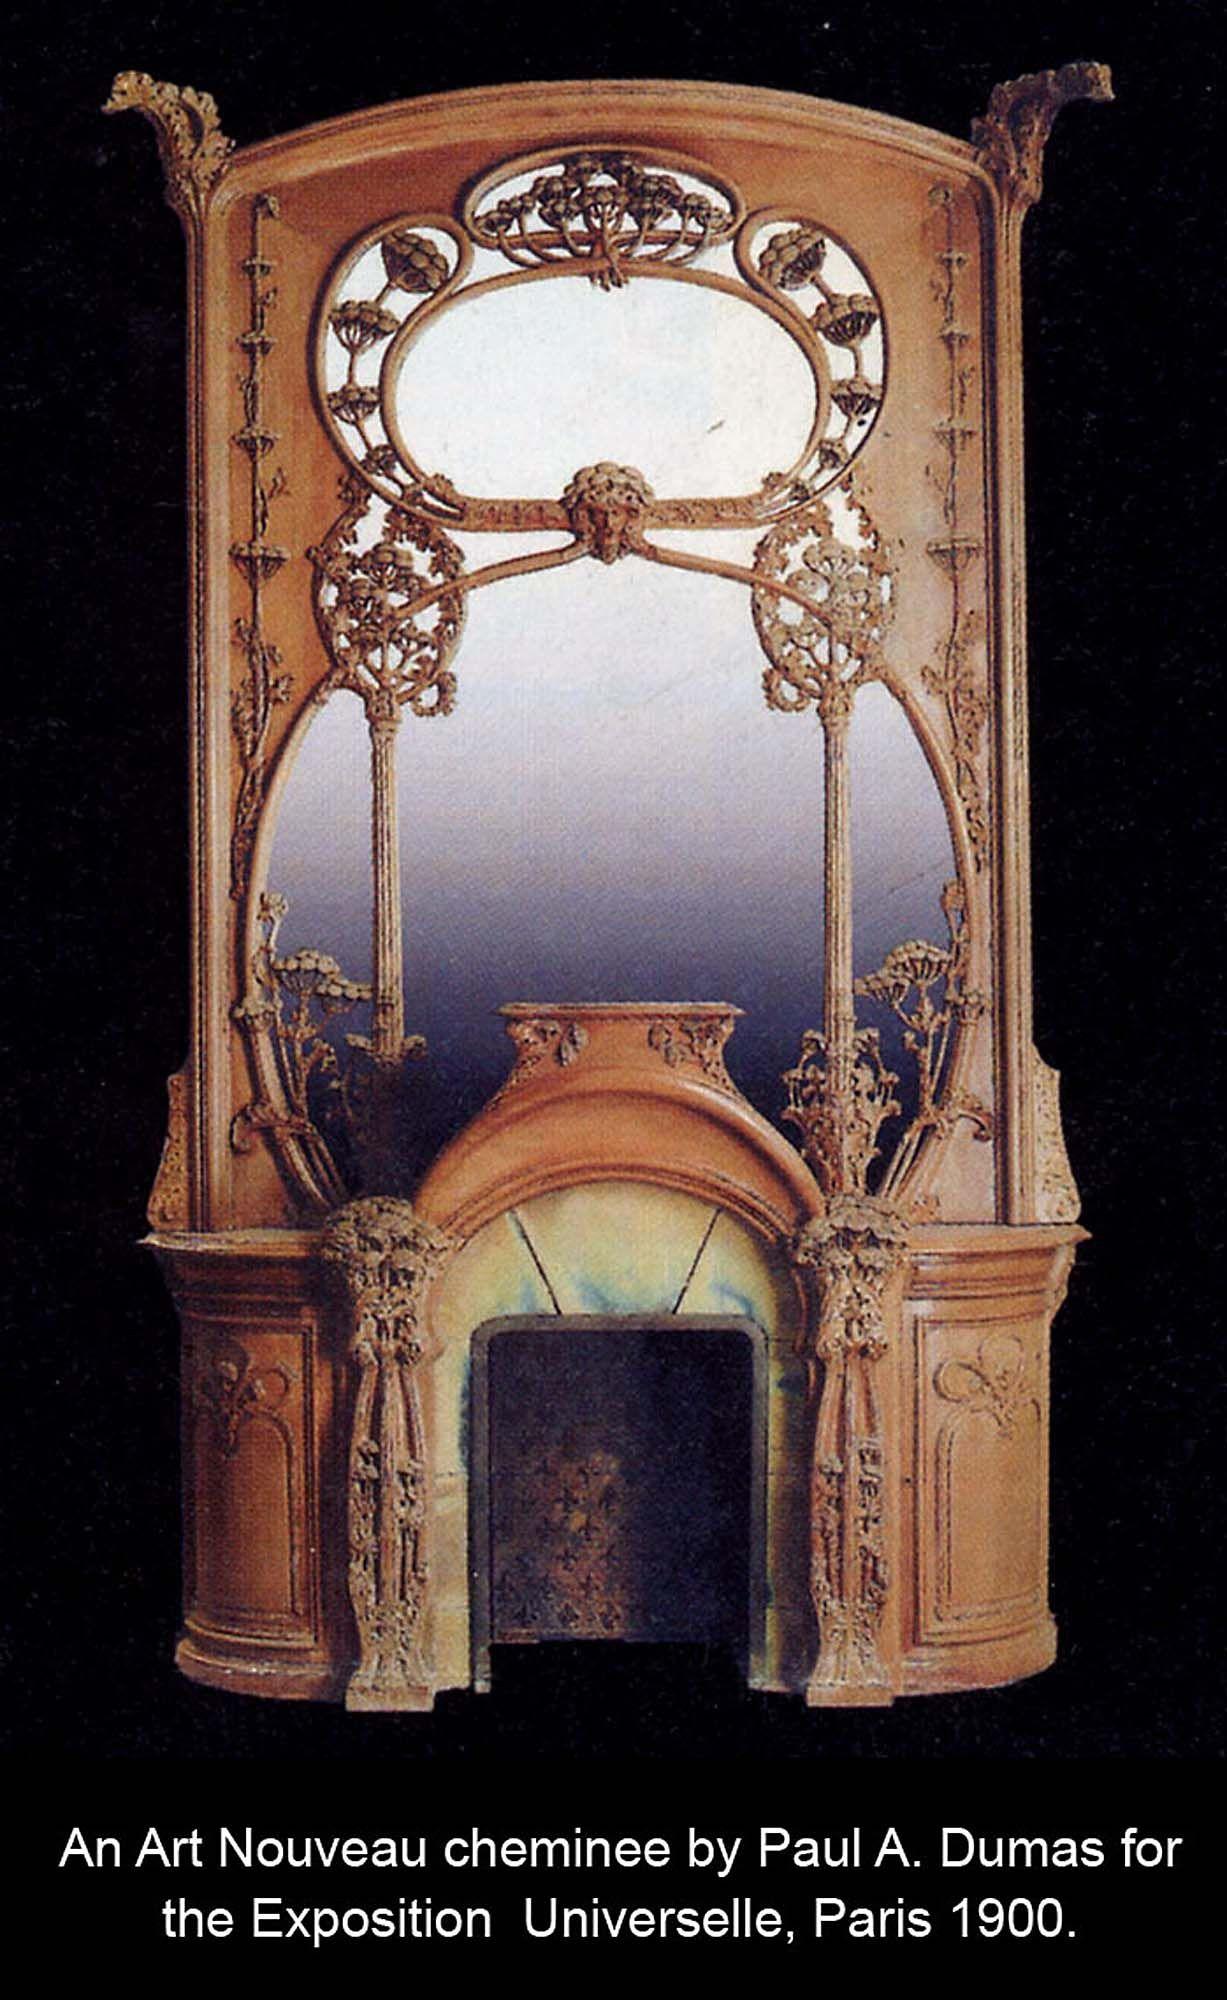 art nouveau antique fireplace mantel art nouveau pinterest jugendstil feuerstelle kamin. Black Bedroom Furniture Sets. Home Design Ideas